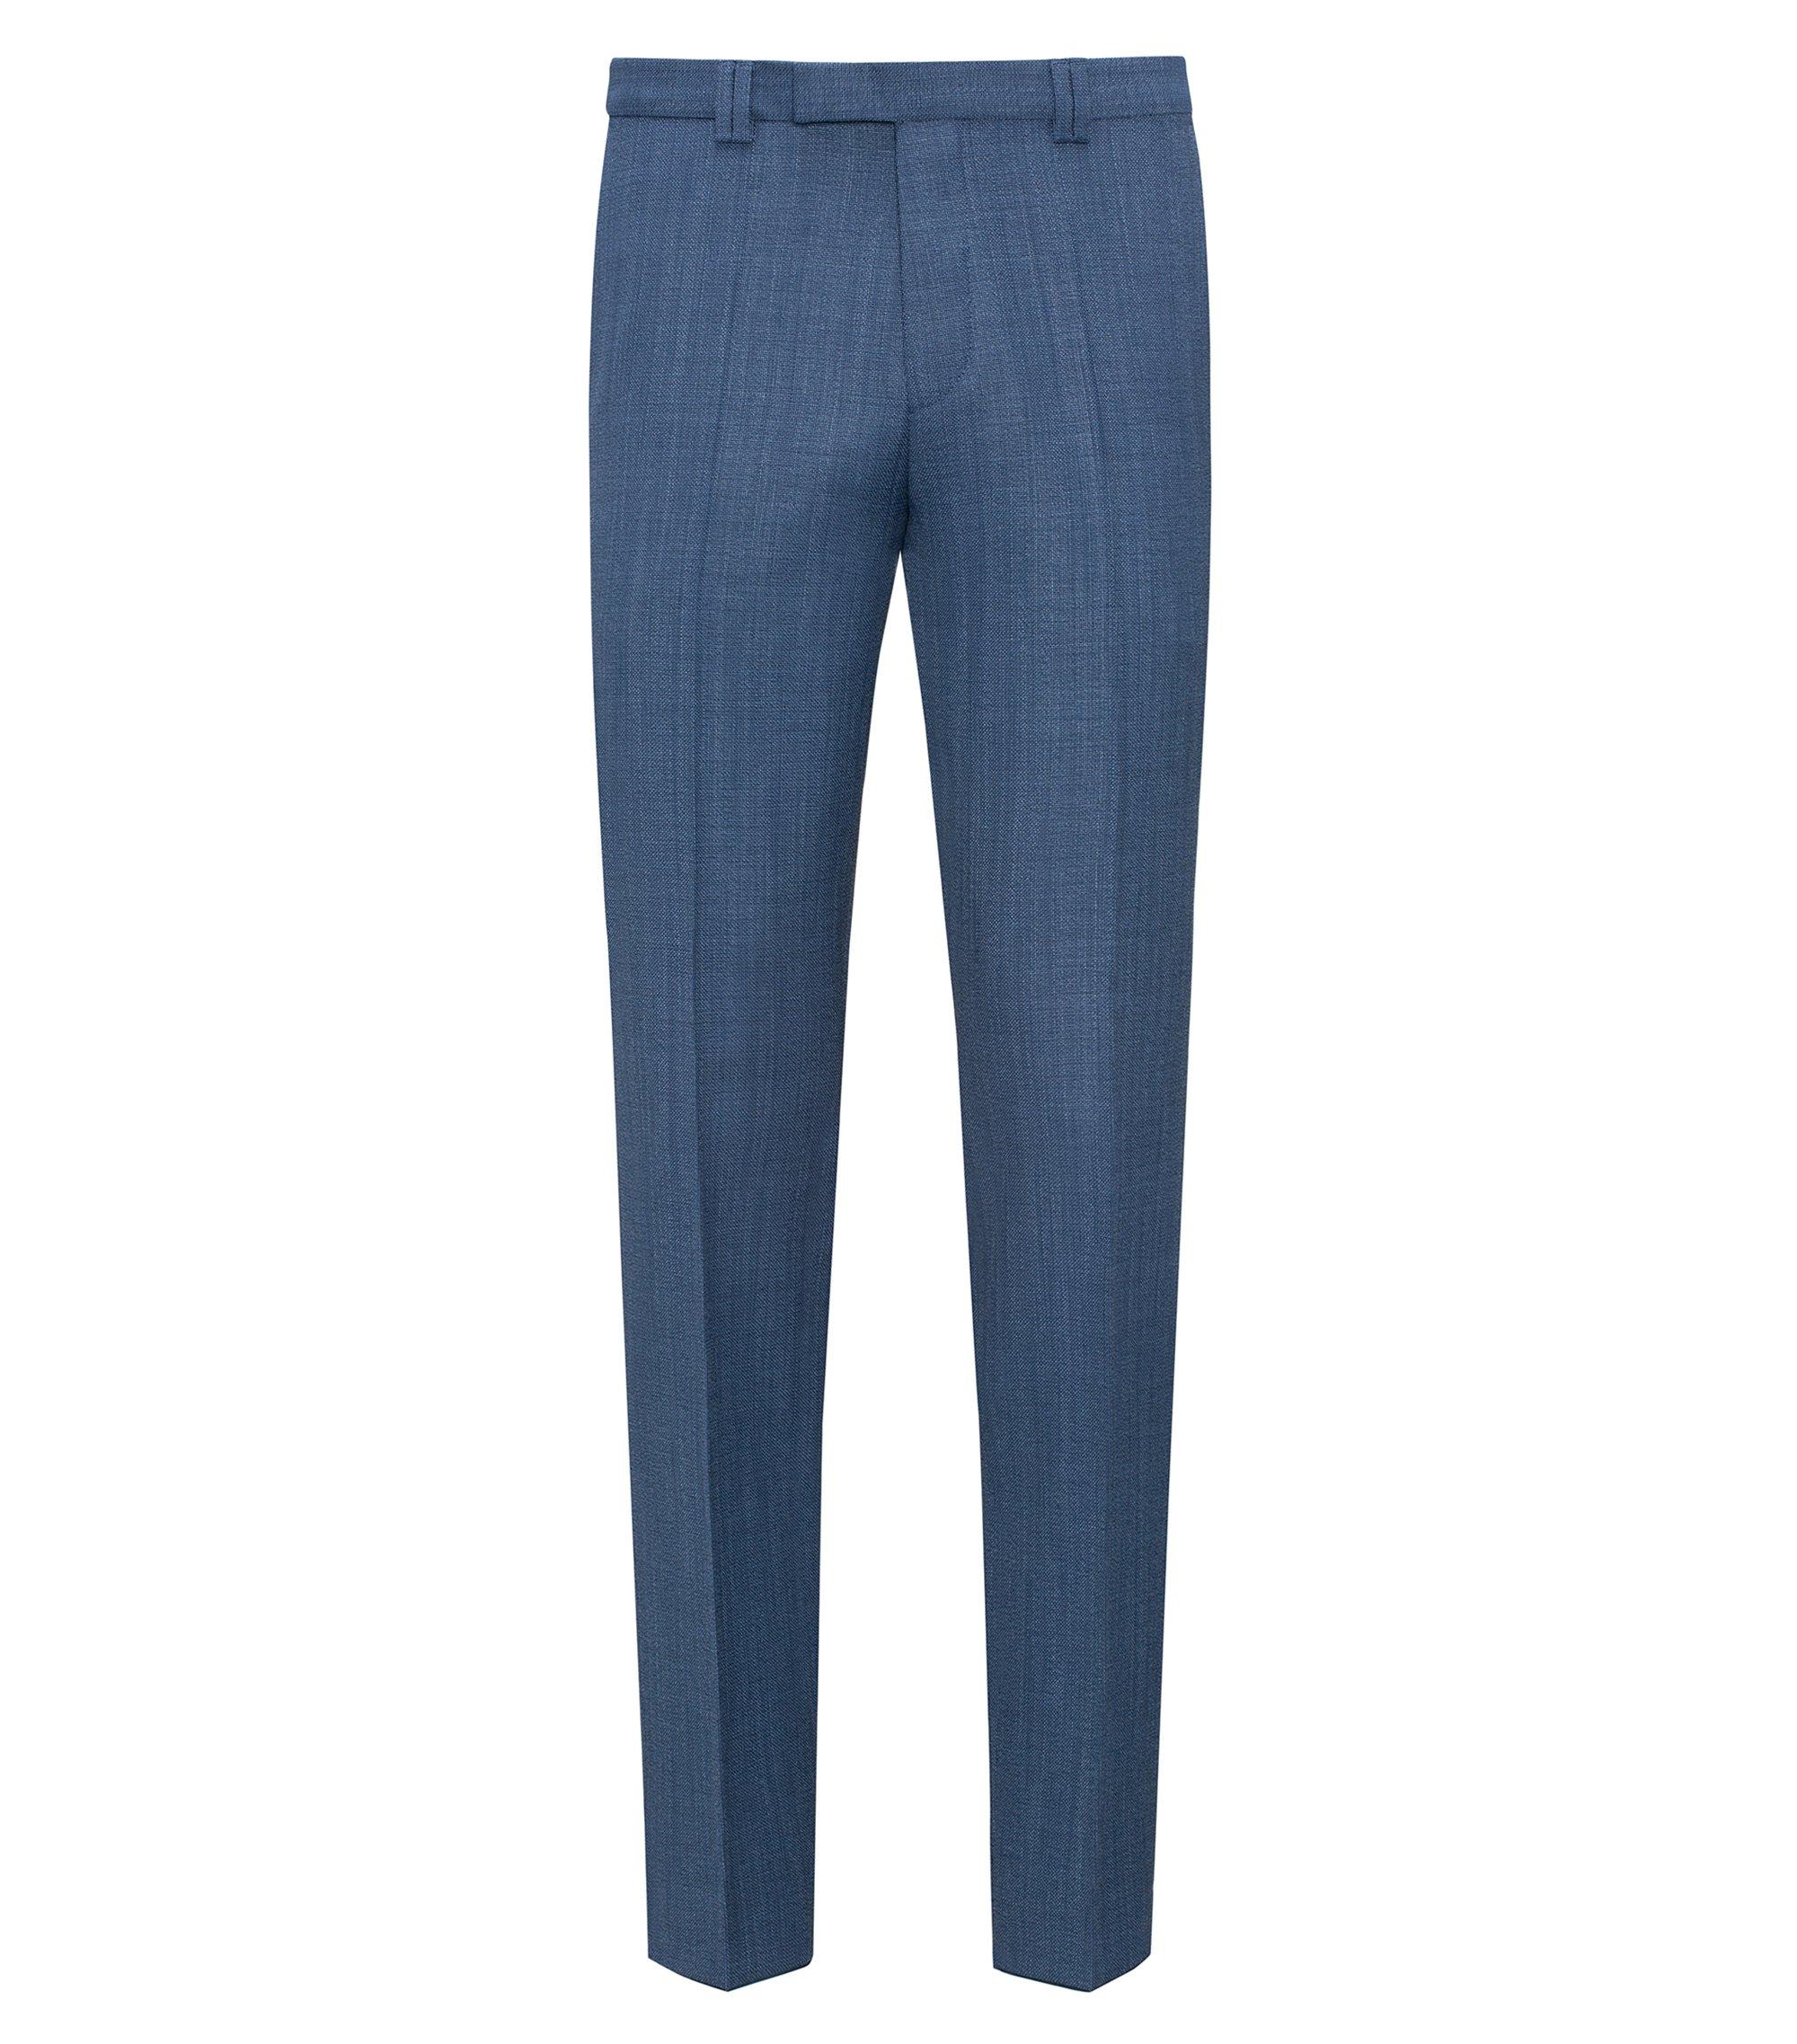 Pantaloni extra slim fit in lana effetto nattè , Blu